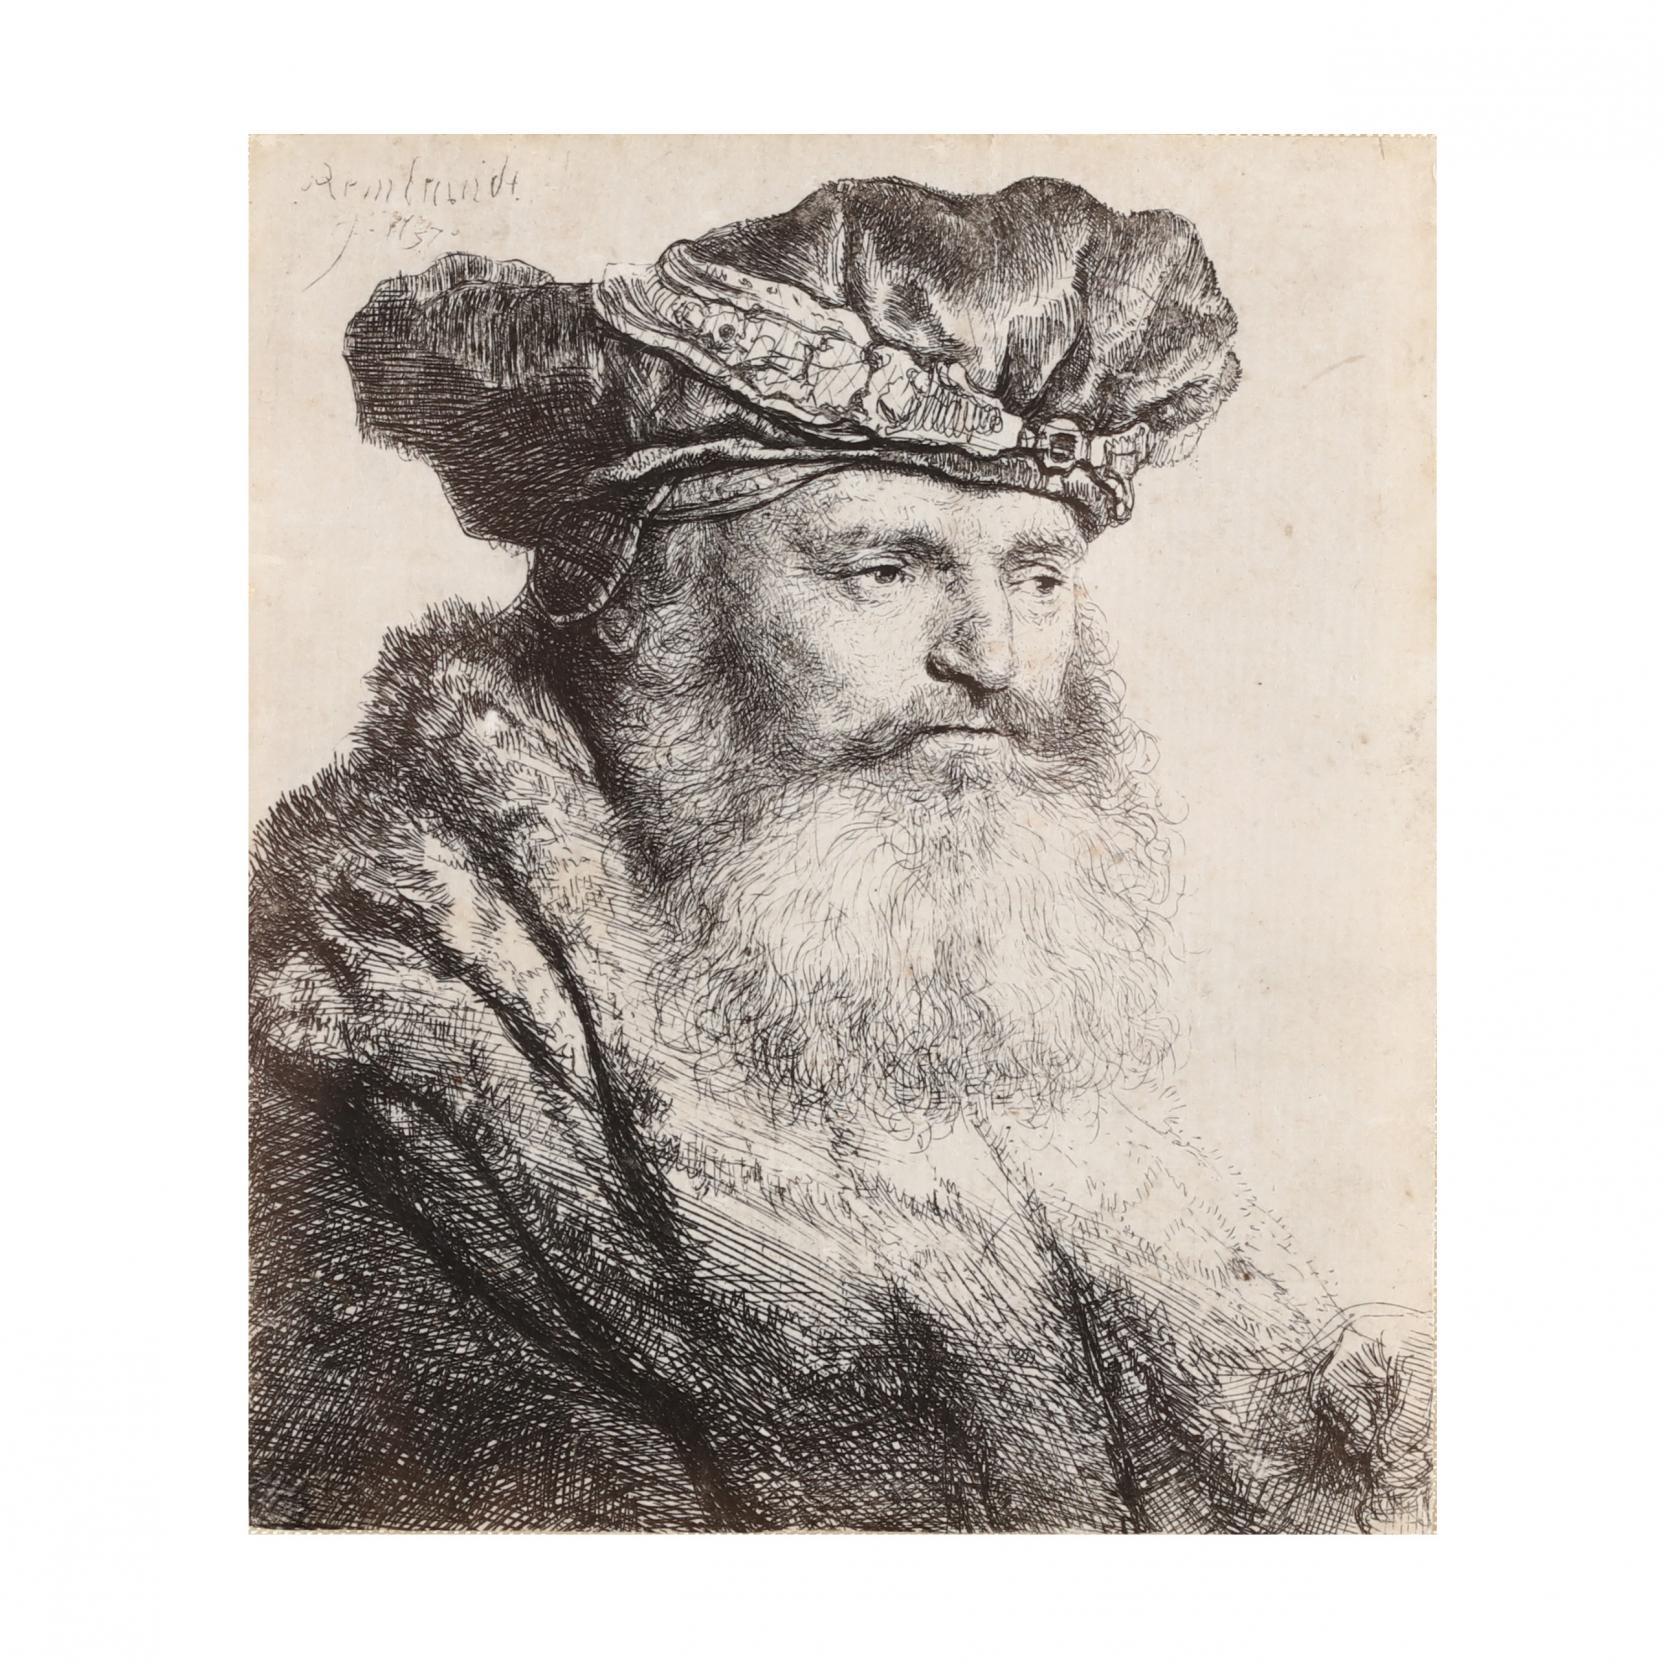 rembrandt-van-rijn-dutch-1606-1669-i-bearded-man-in-a-velvet-cap-with-a-jewel-clasp-i